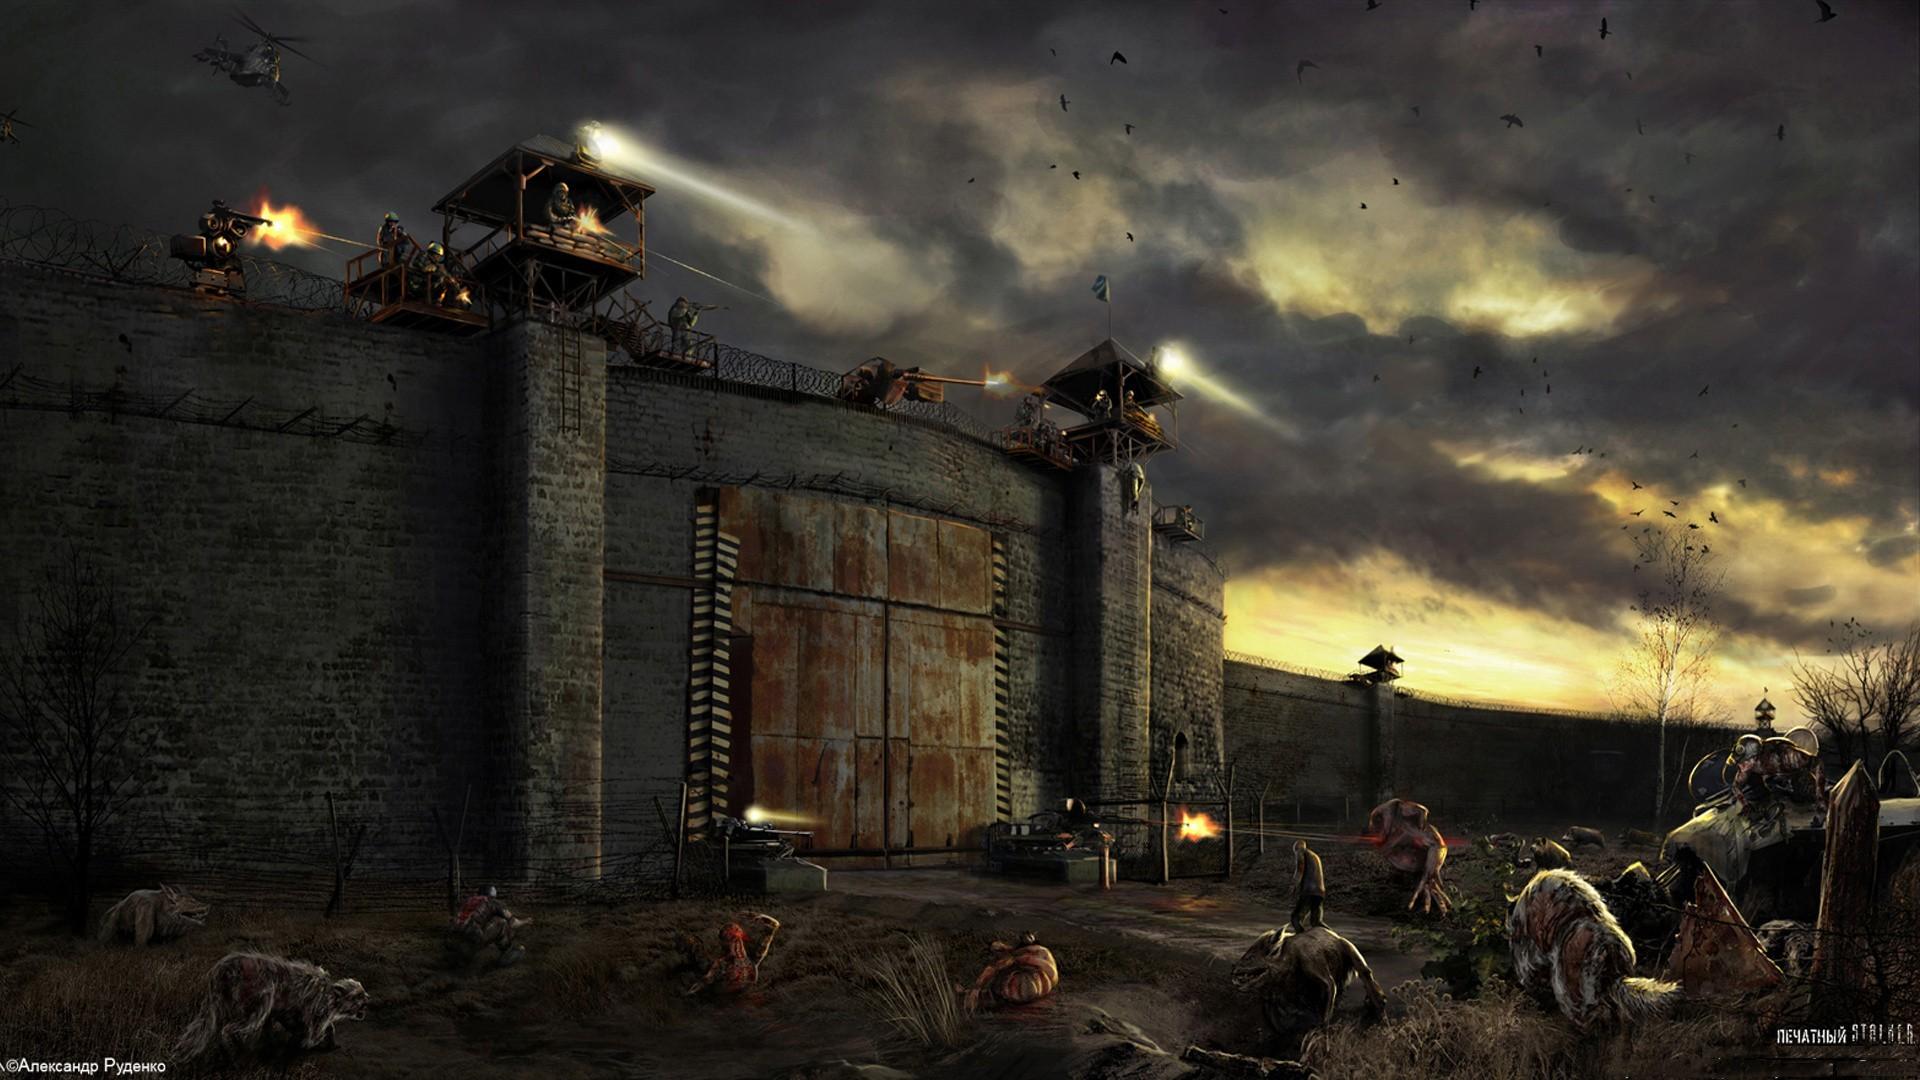 Zombie Apocalypse wallpaper ·① Download free full HD ...